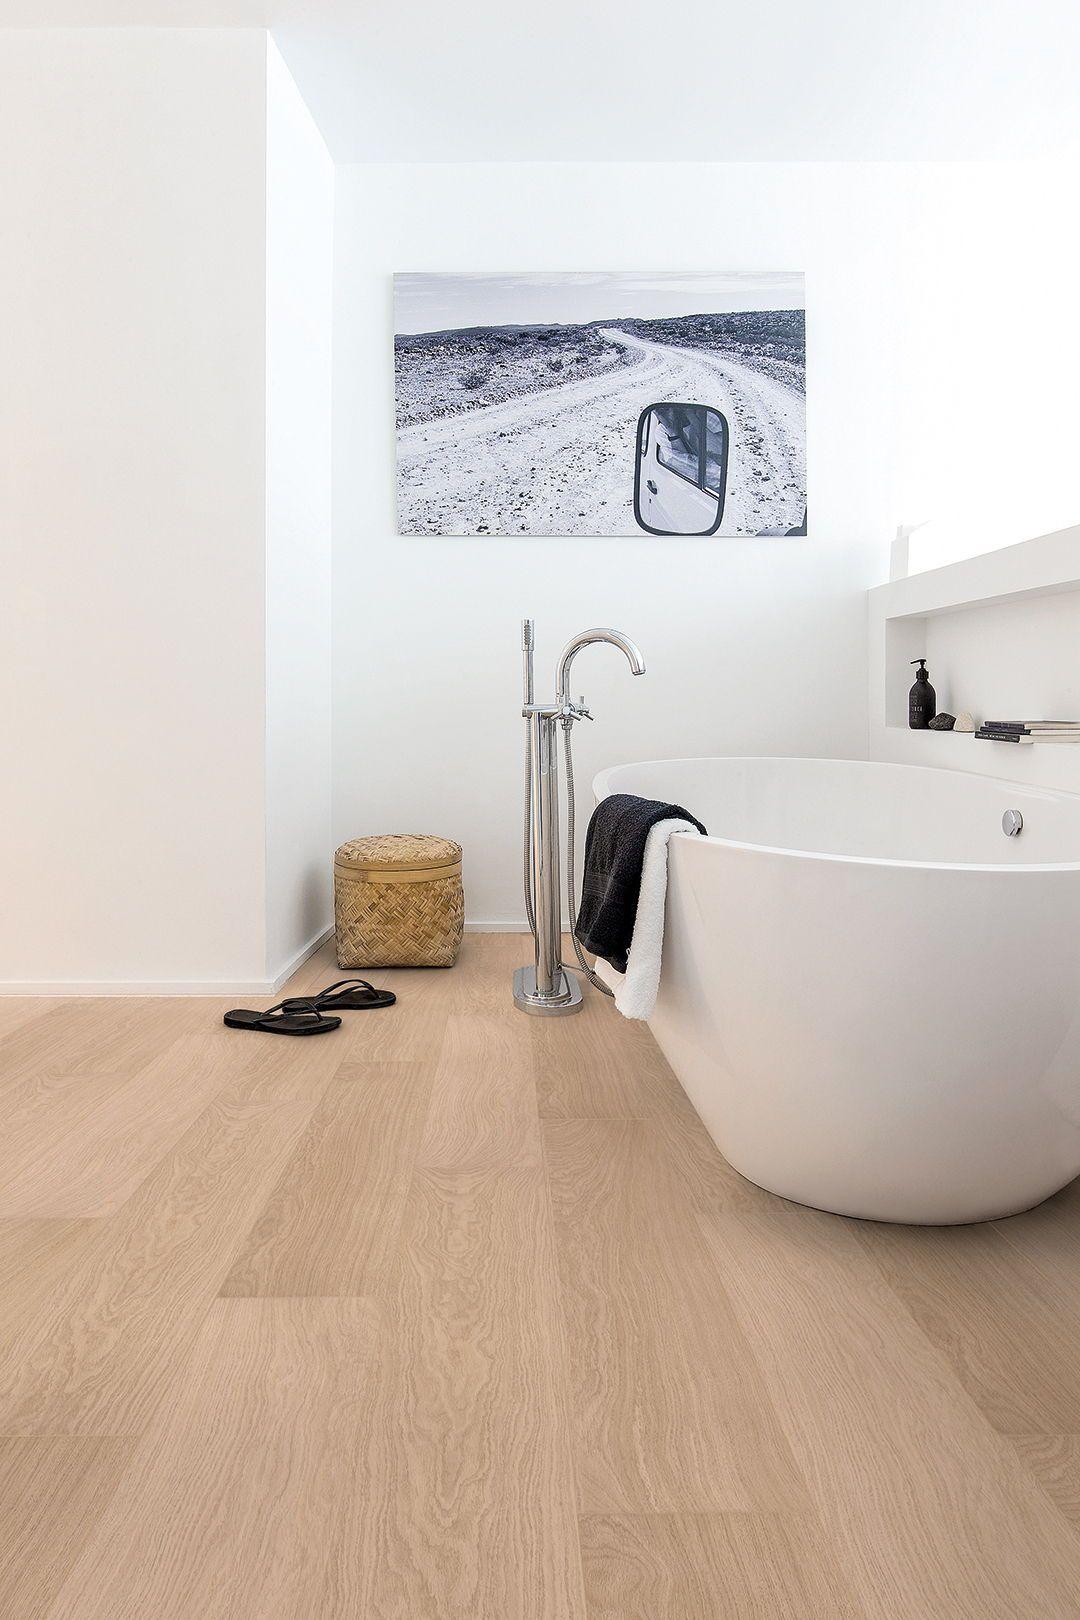 Choose The Perfect Bathroom Floor Quick Step Co Uk Waterproof Bathroom Flooring Waterproof Laminate Flooring Wood Floor Bathroom